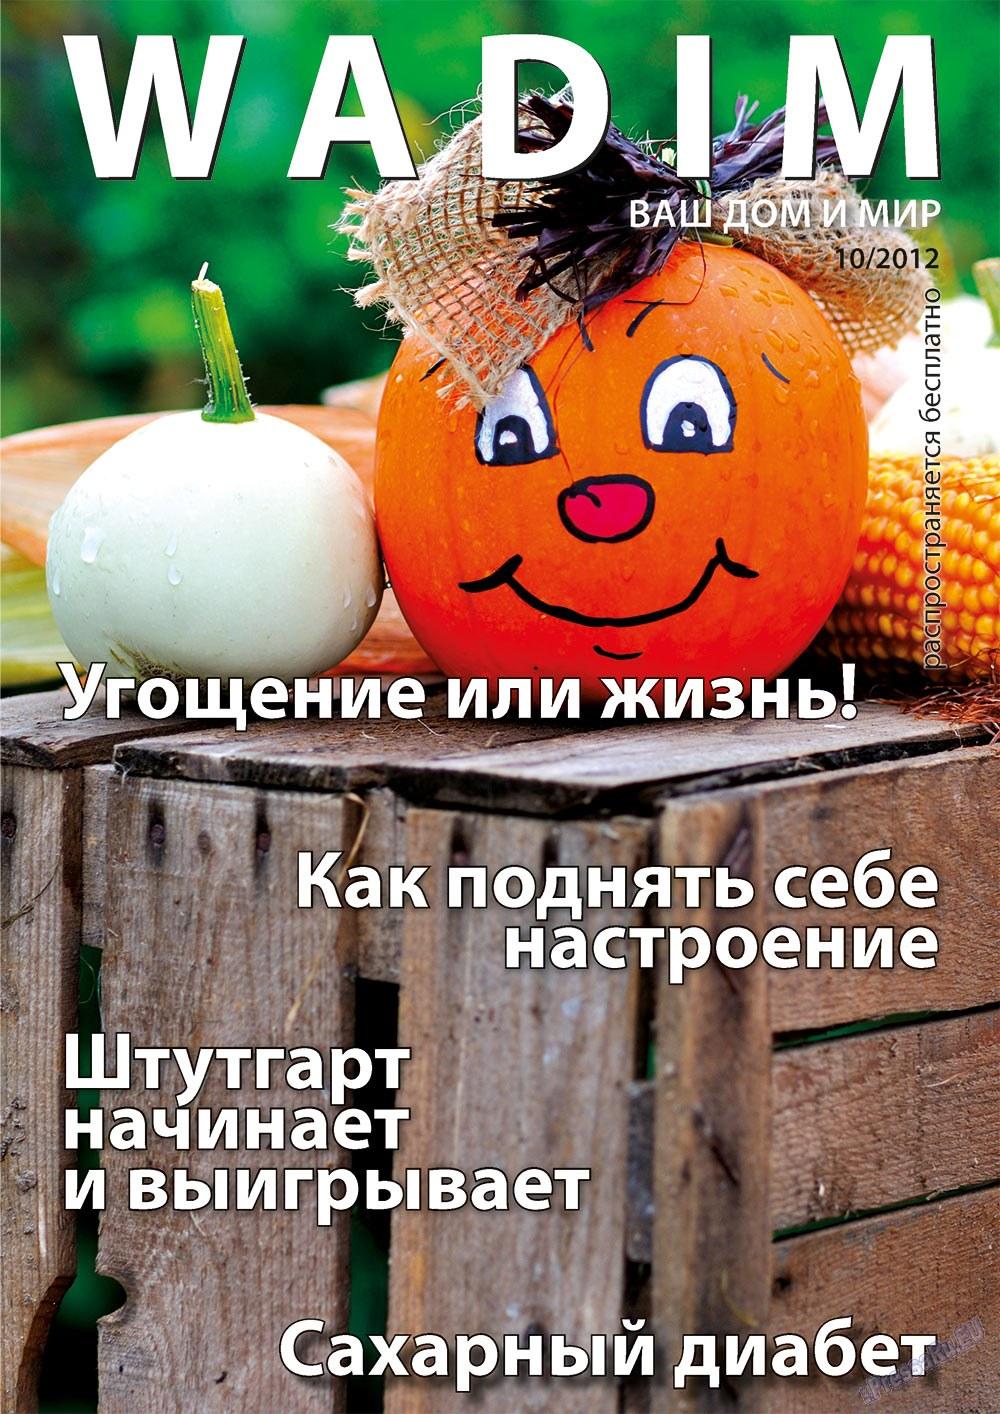 Wadim (журнал). 2012 год, номер 10, стр. 1